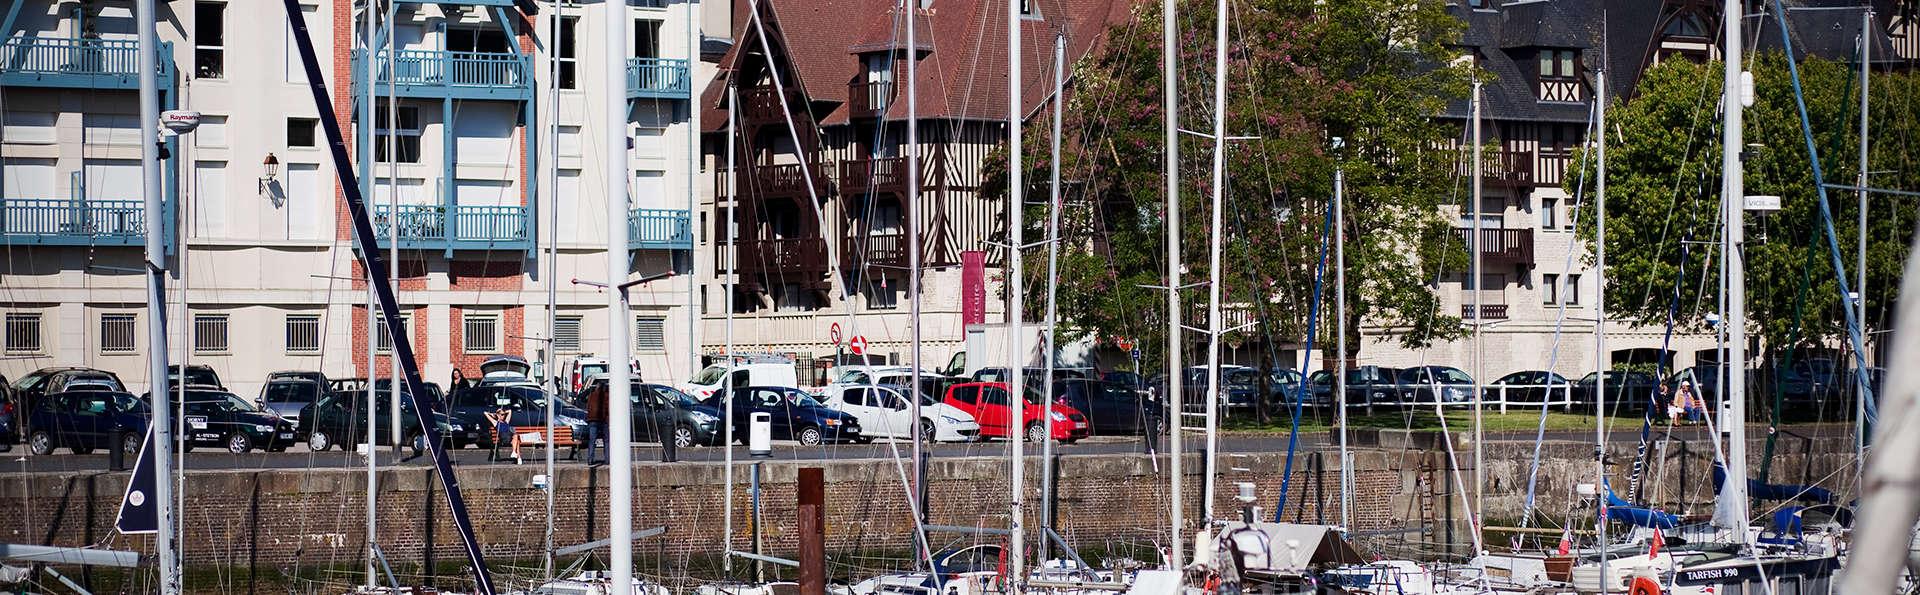 Mercure Deauville Centre - Edit_Boat.jpg